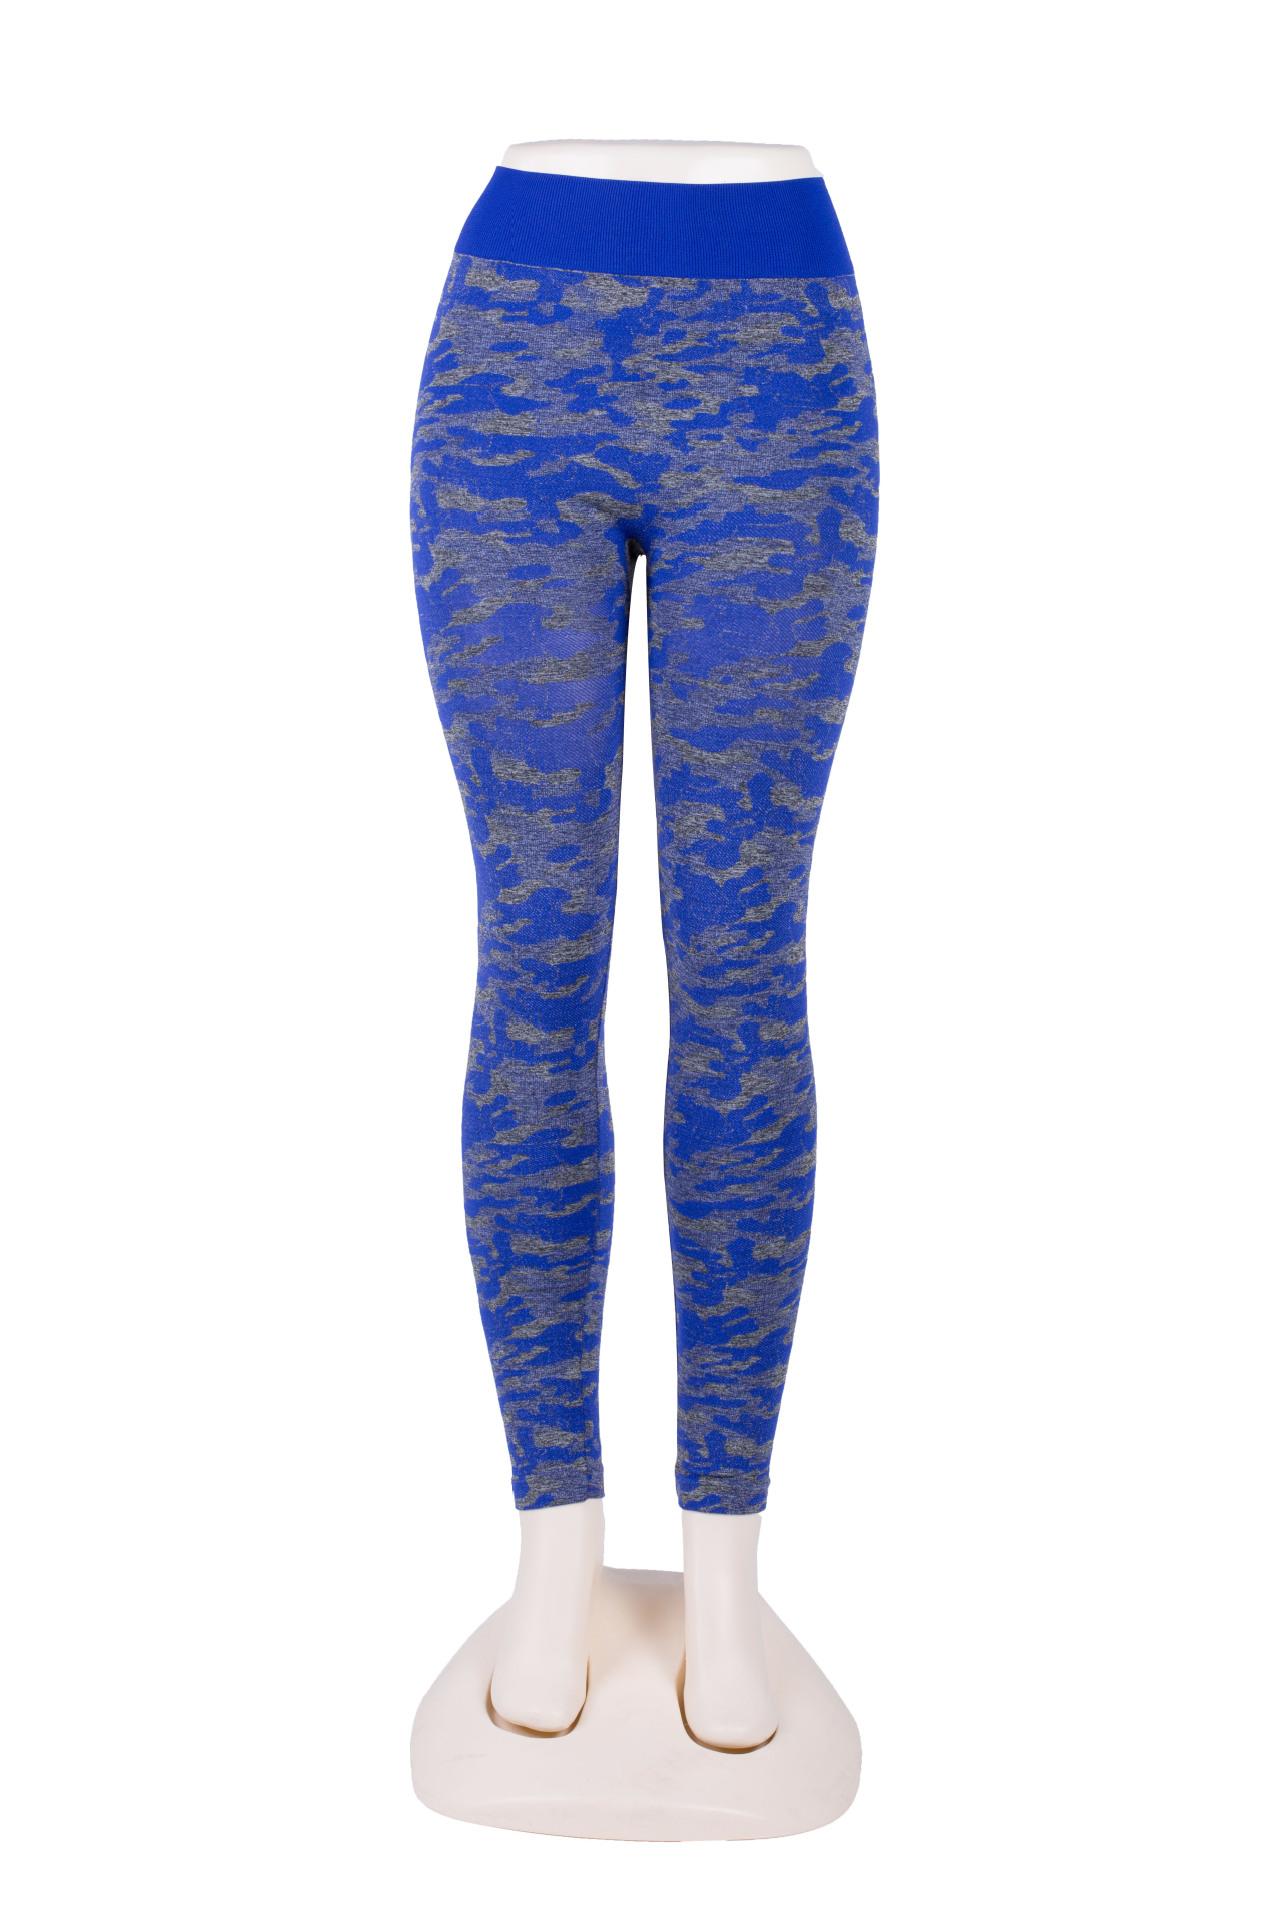 camouflage multicolor hip high waist yoga pants NSLX9680